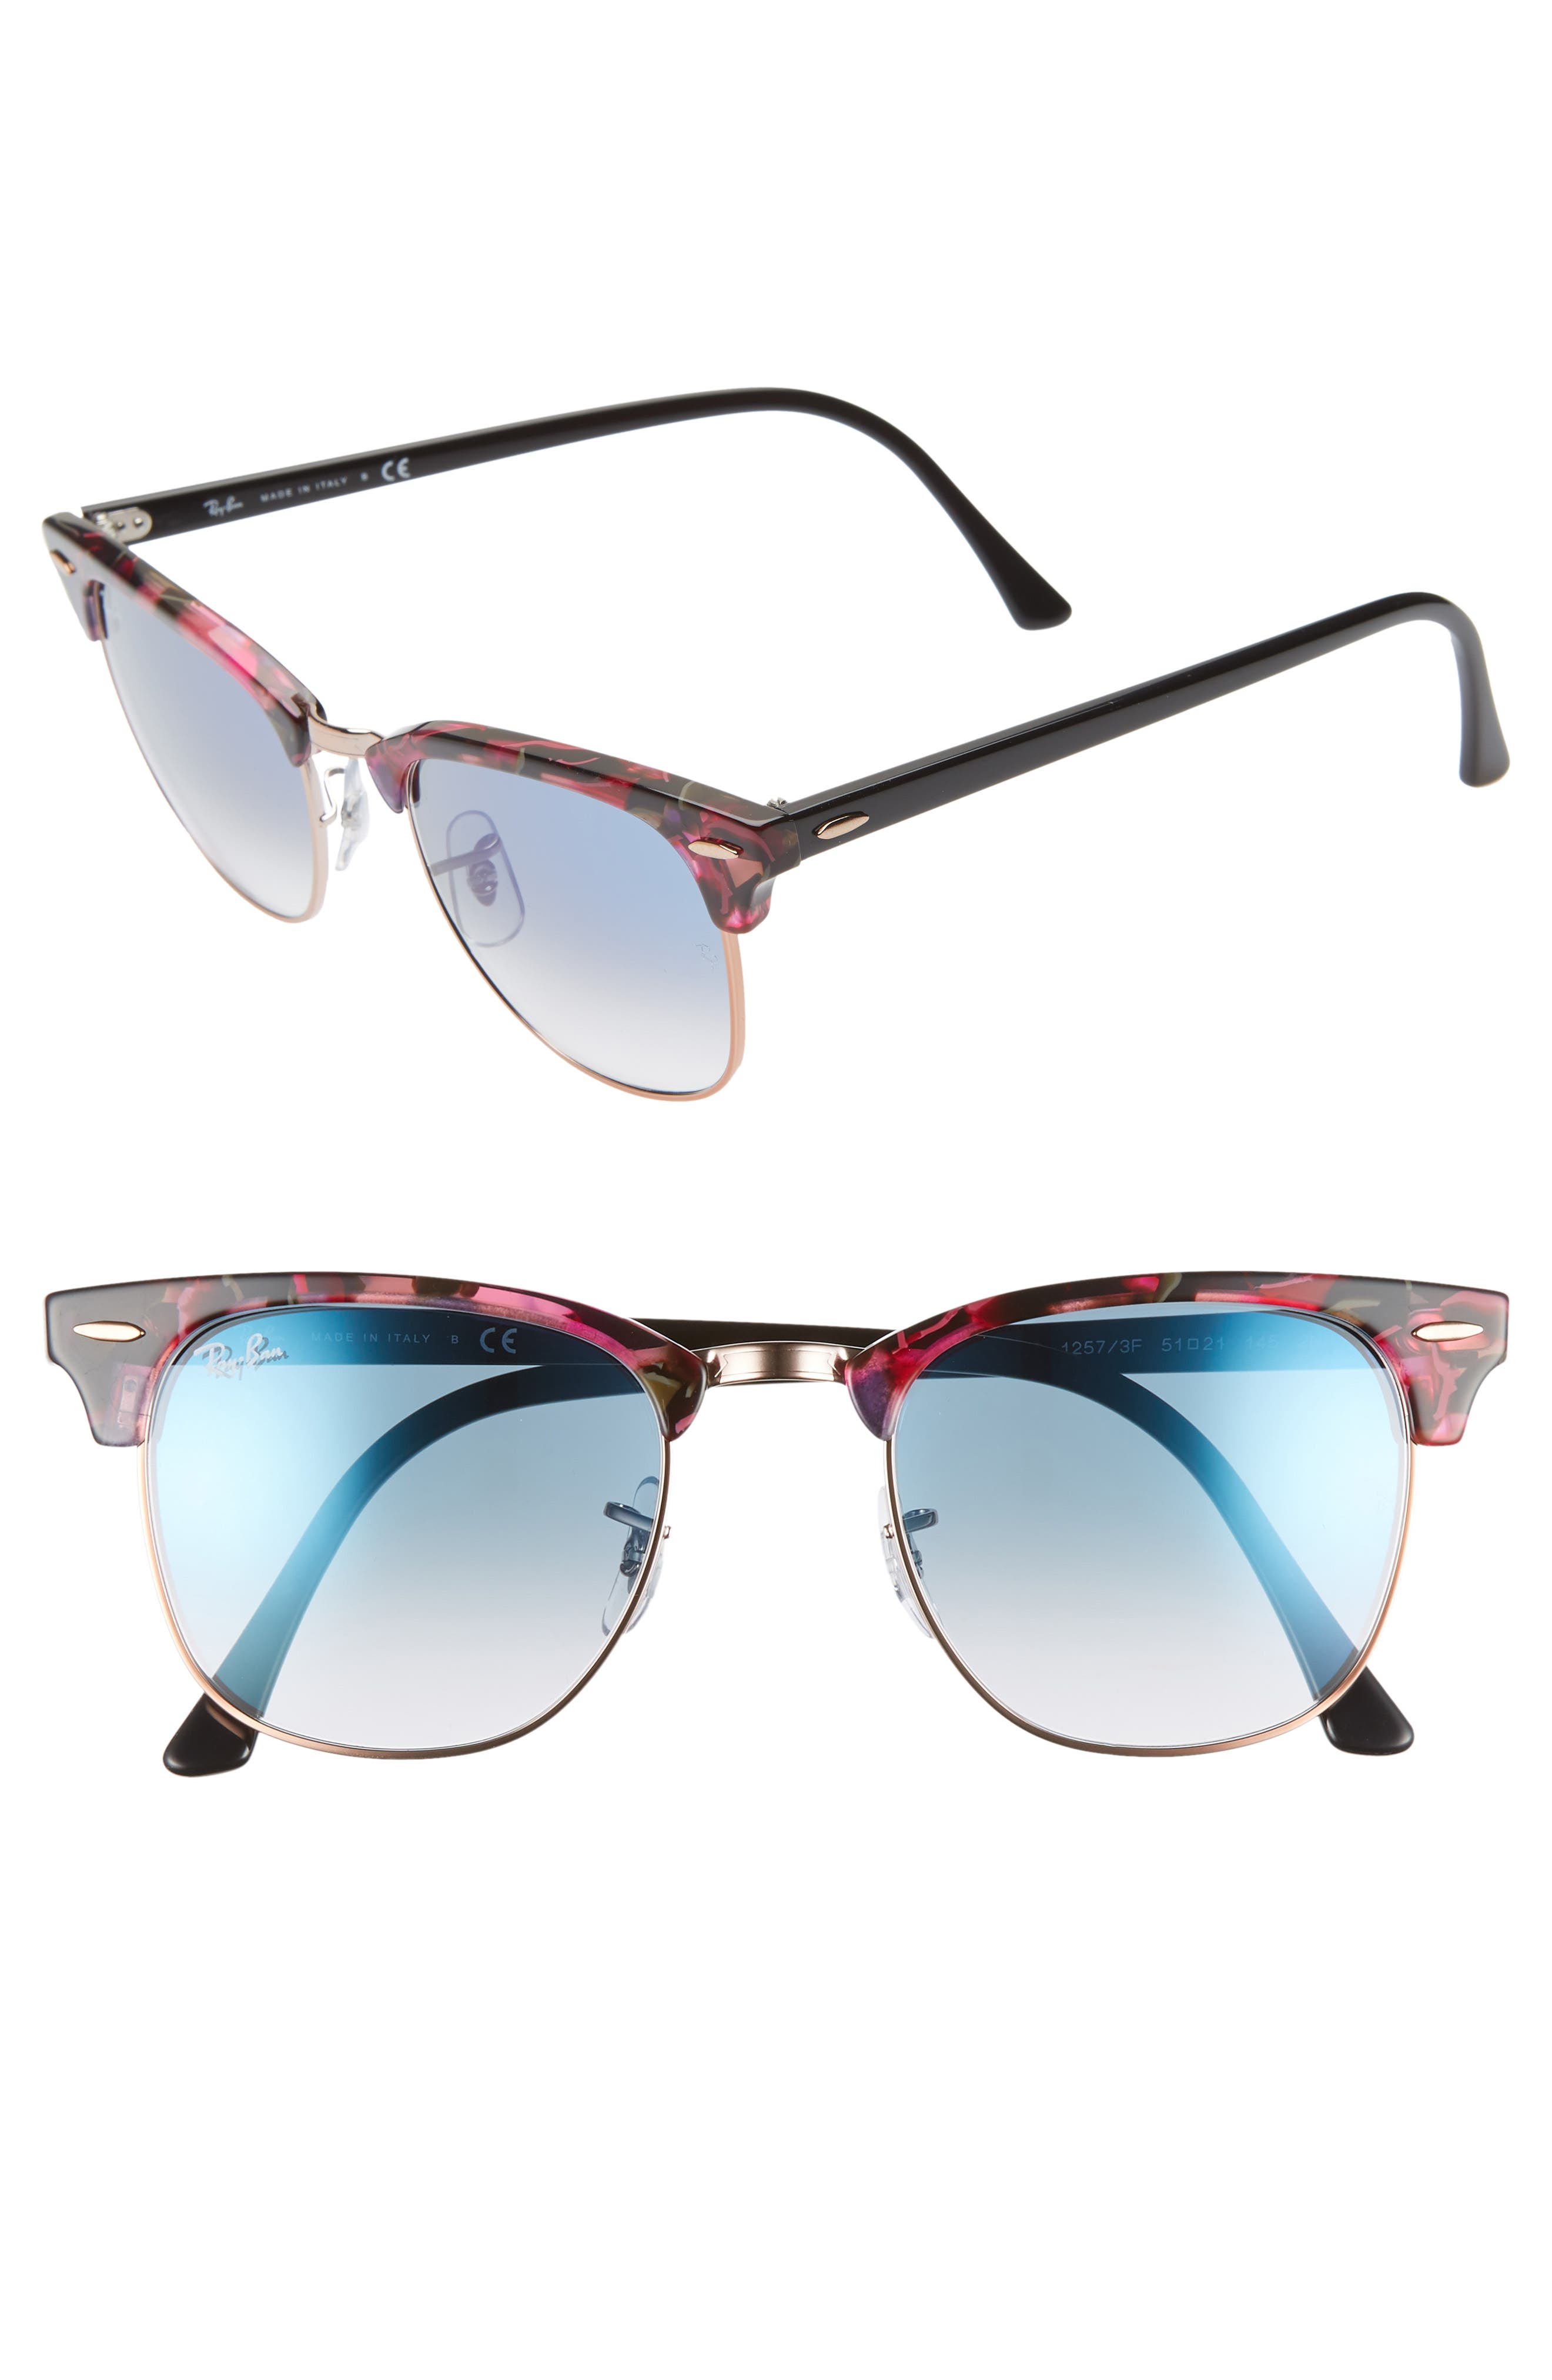 Clubmaster 51mm Gradient Sunglasses,                         Main,                         color, GREY/ VIOLET GRADIENT